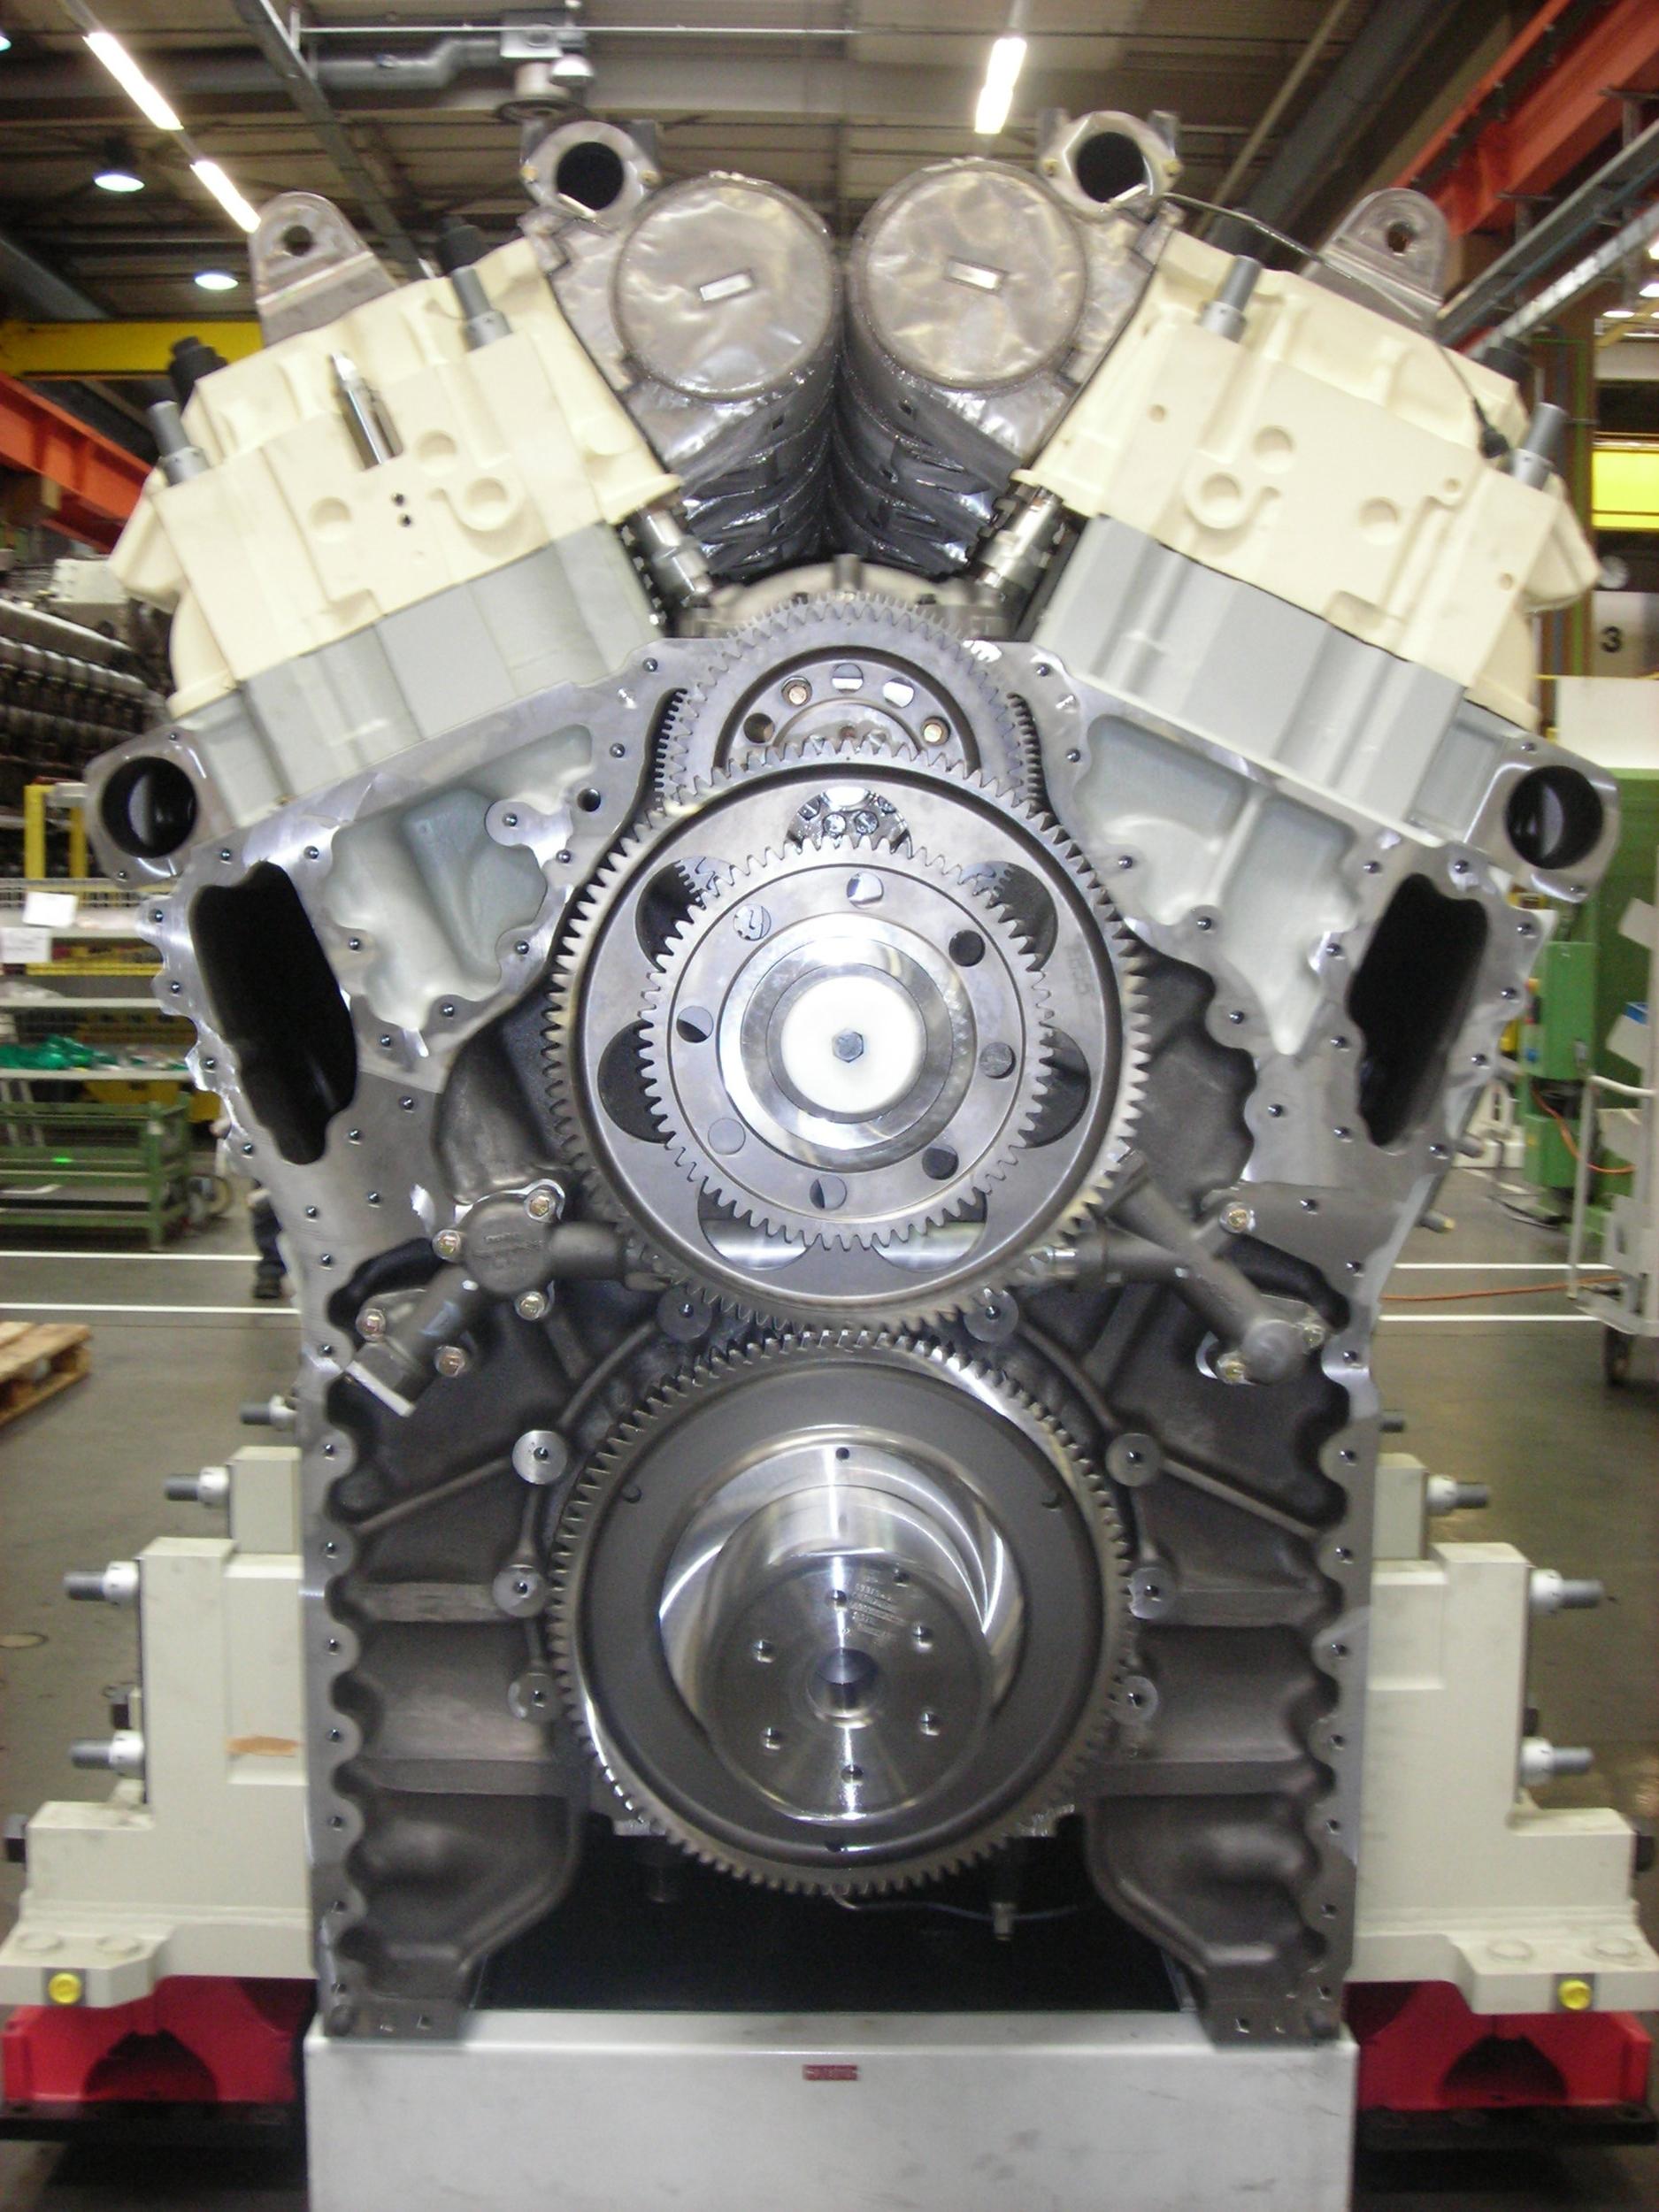 MTU series 8000 -Crankshaft.camshaft,gears,power units ,exhaust manifolds